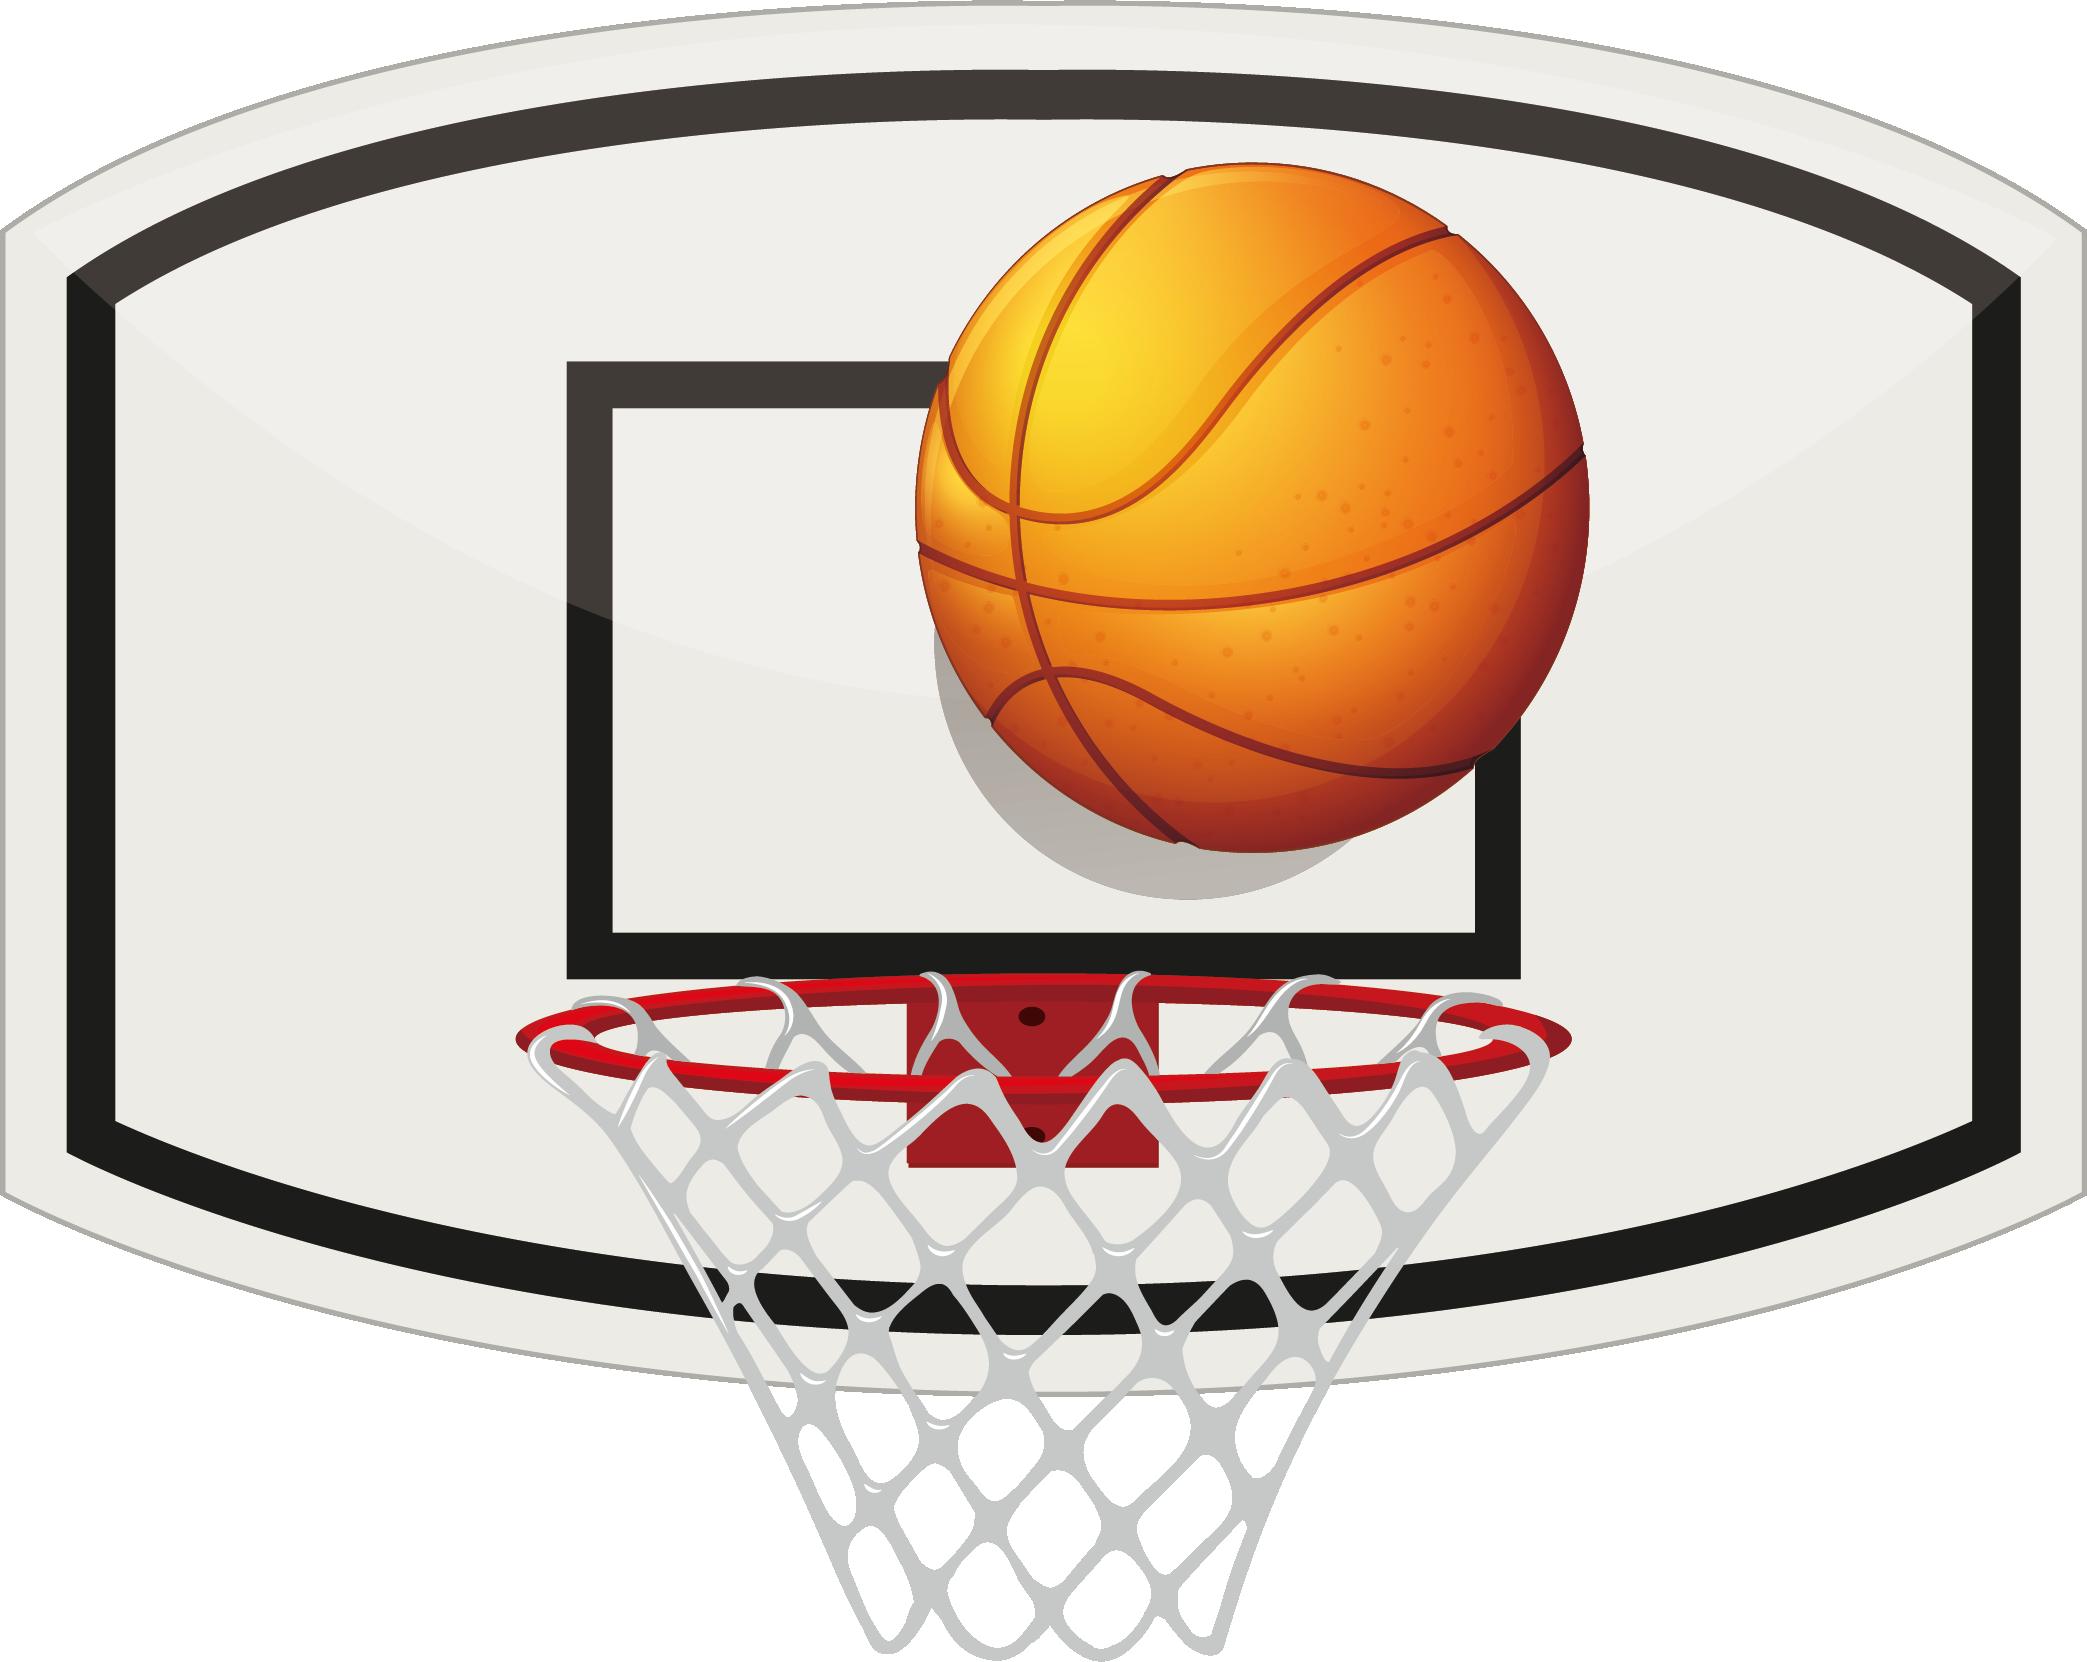 Basketball back board hoop clipart vector stock Basketball Backboard Stock photography - Basketball Basketball 2087 ... vector stock